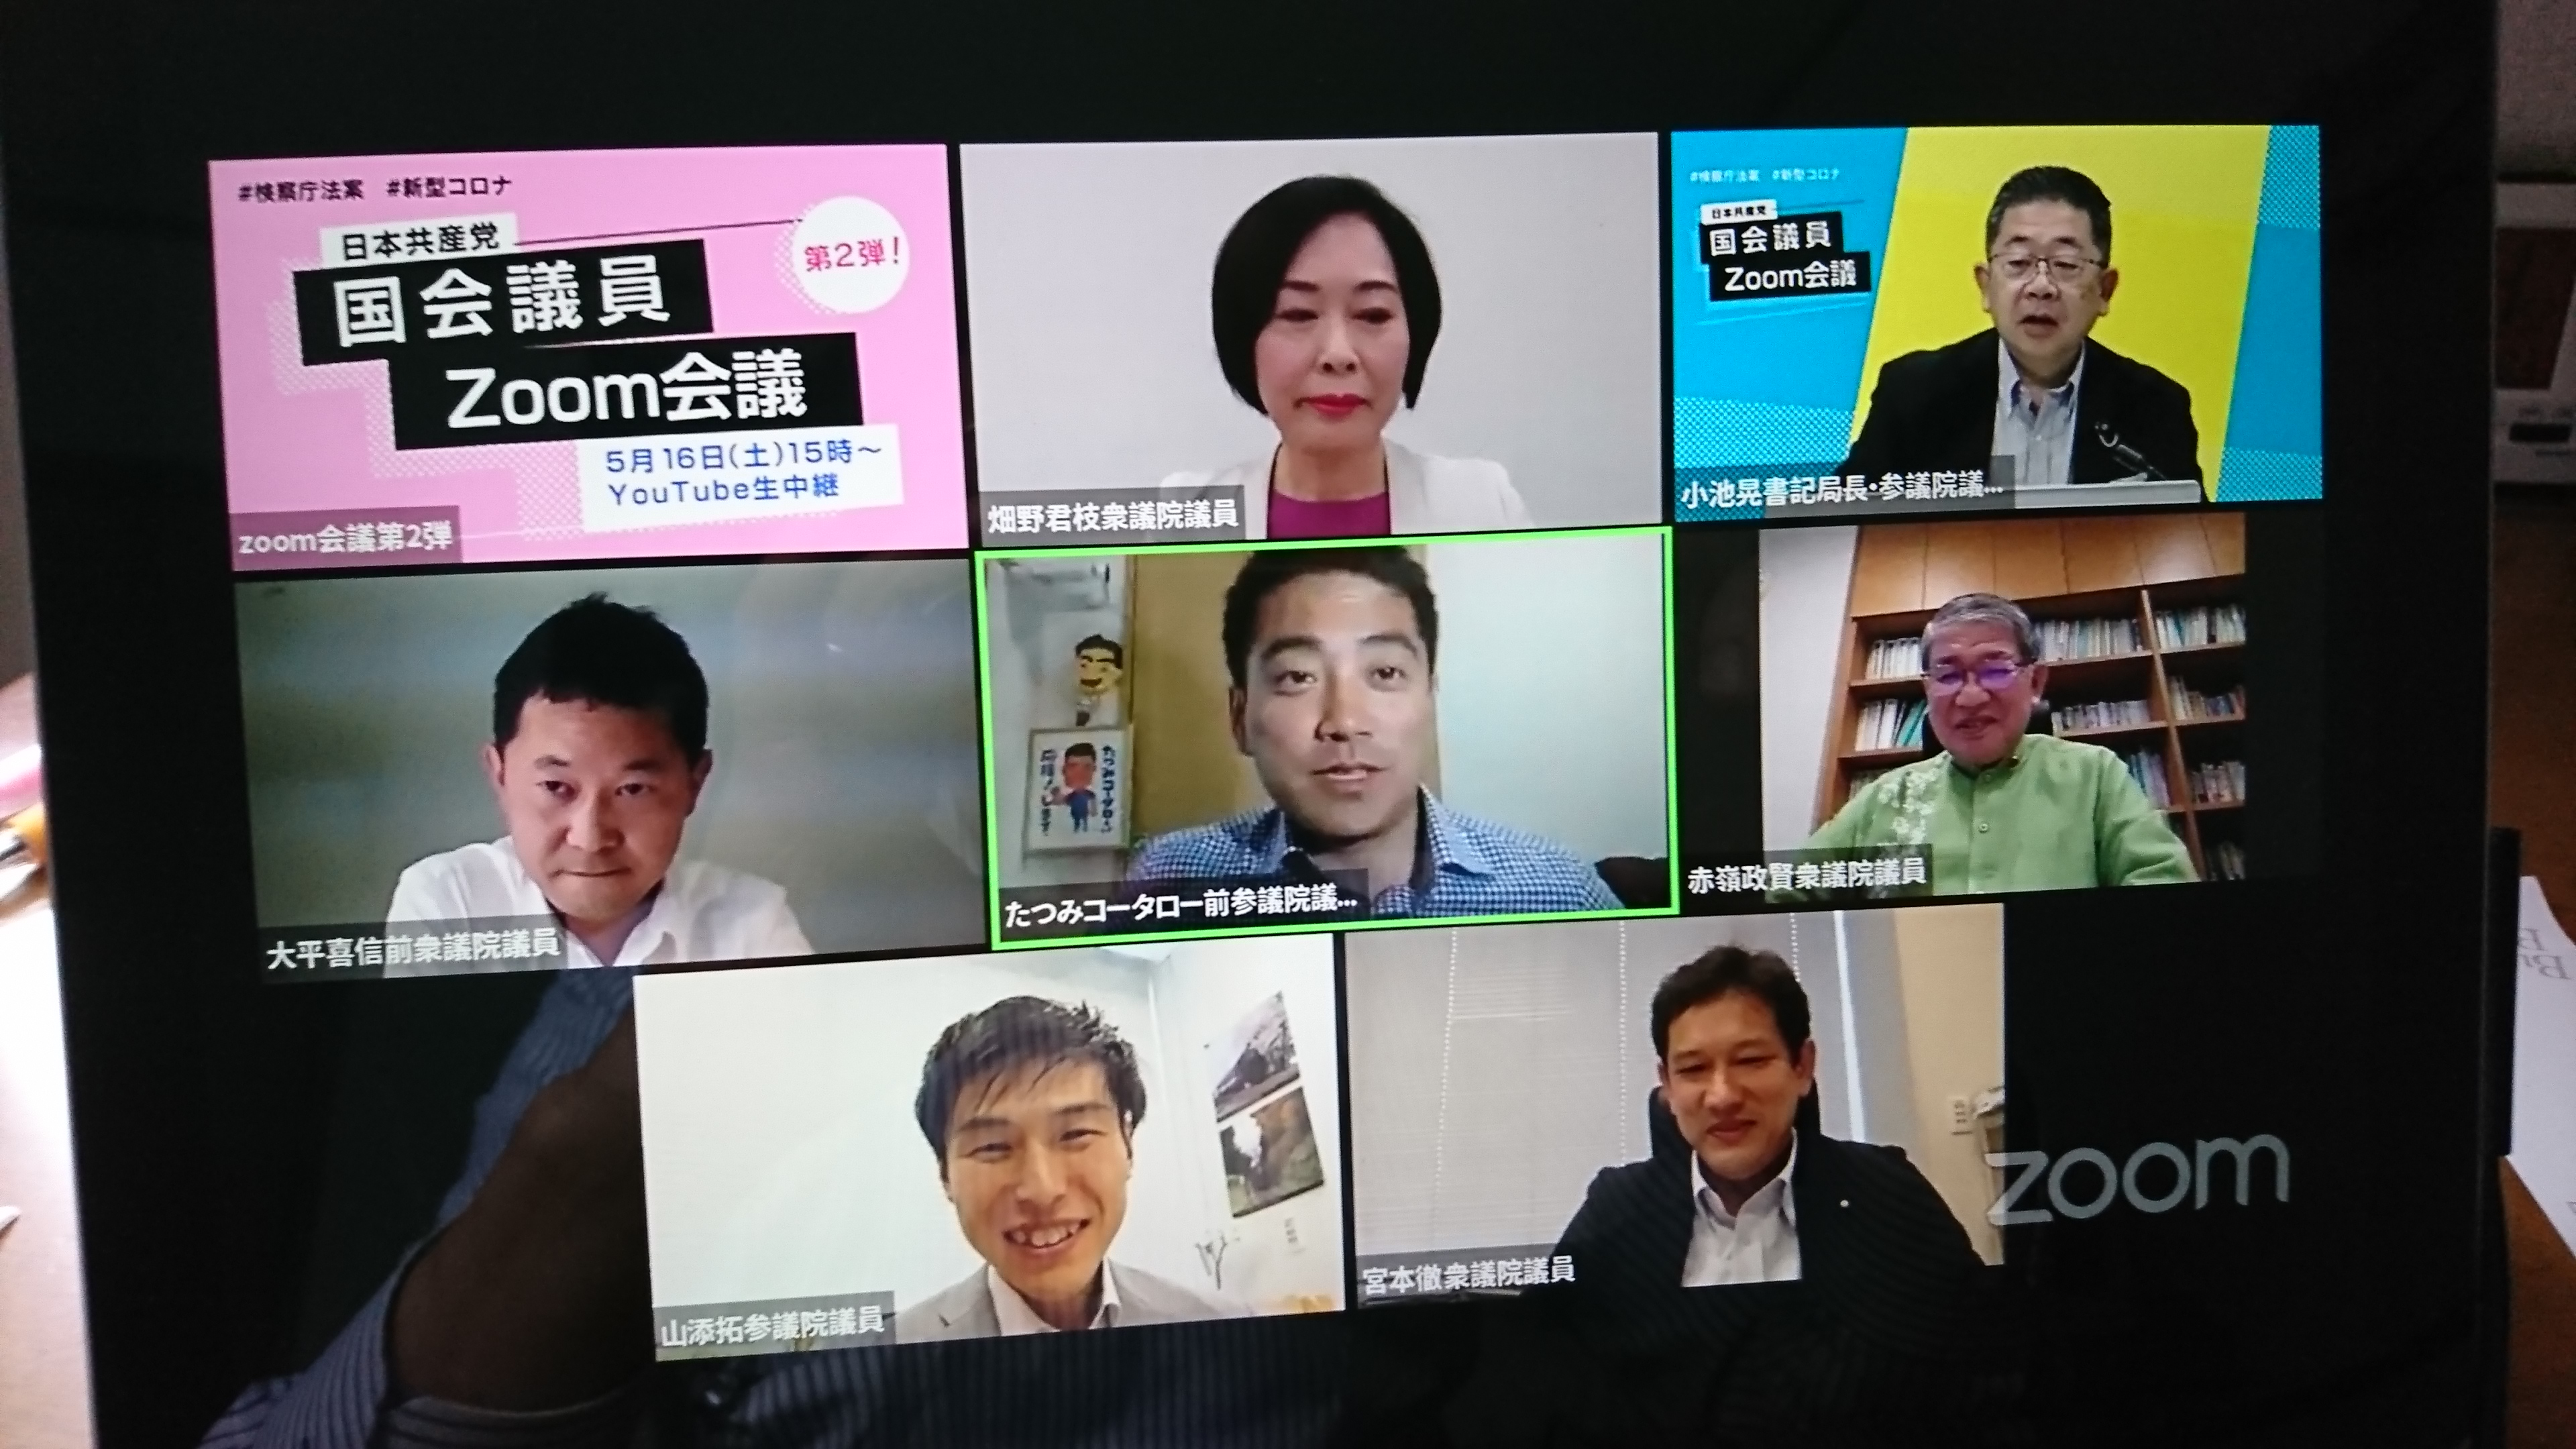 http://www.inoue-satoshi.com/diary/DSC_0060.JPG